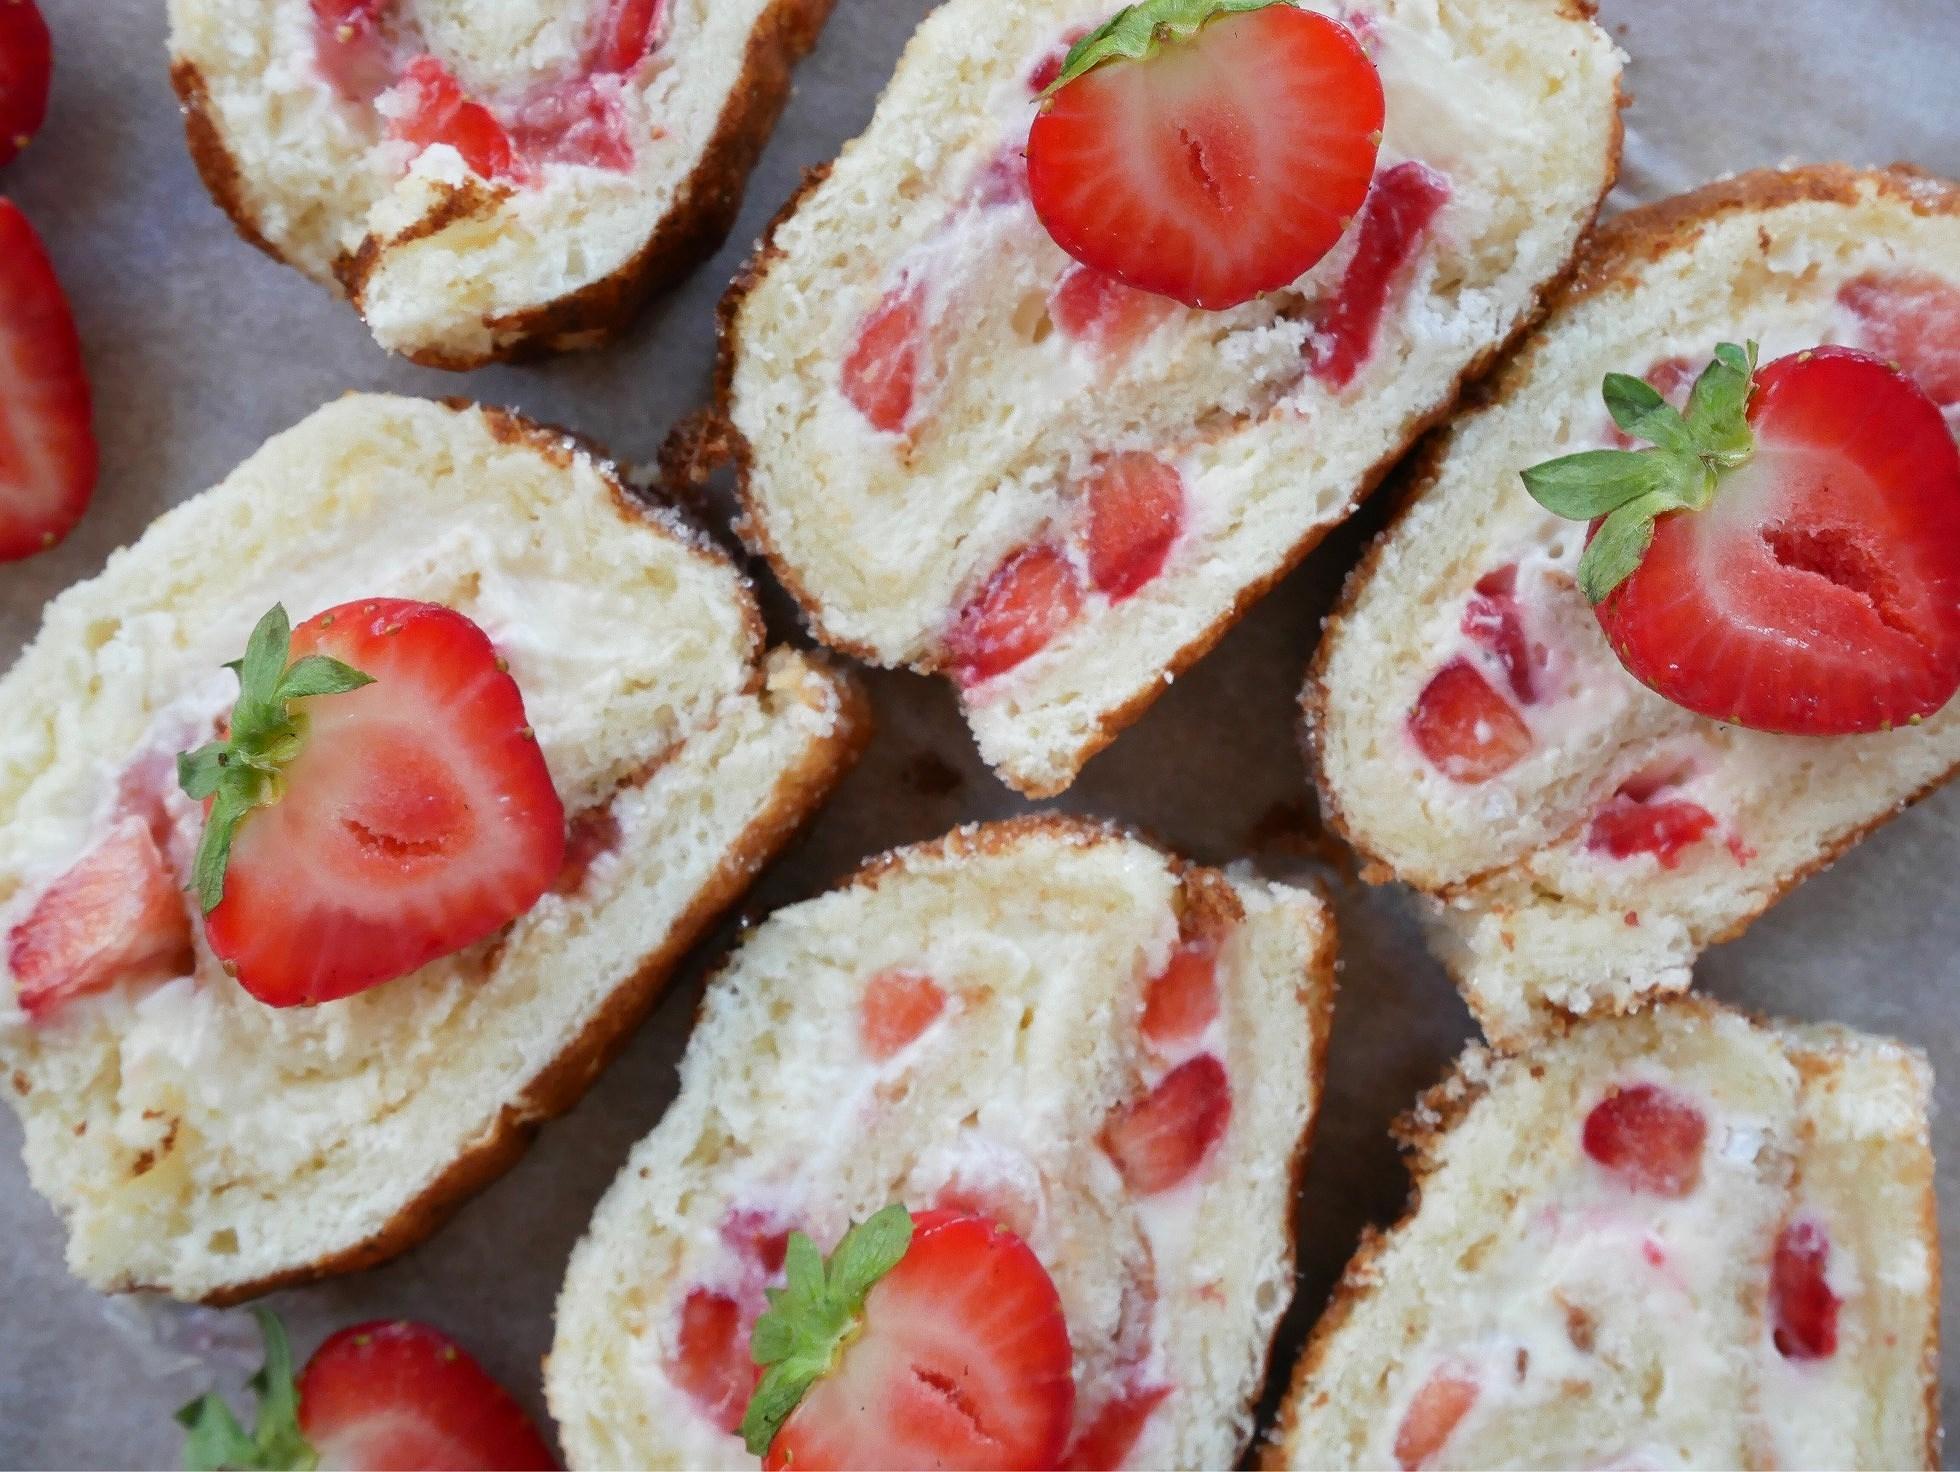 Glutenfri rulltårta med jordgubbar